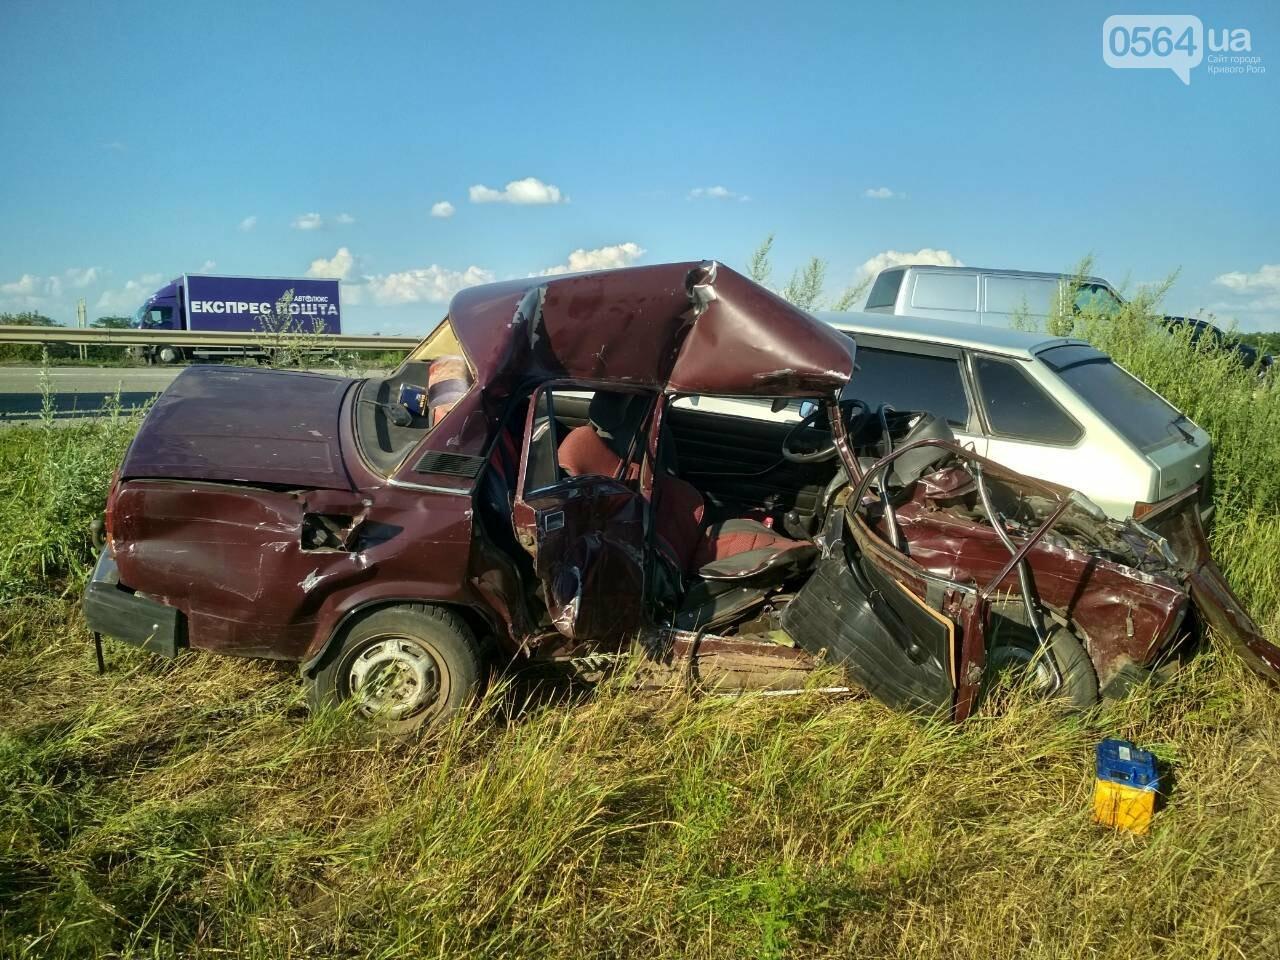 На Днепропетровщине столкнулись маршрутка и 2 легковушки. Один человек погиб, - ФОТО, фото-4